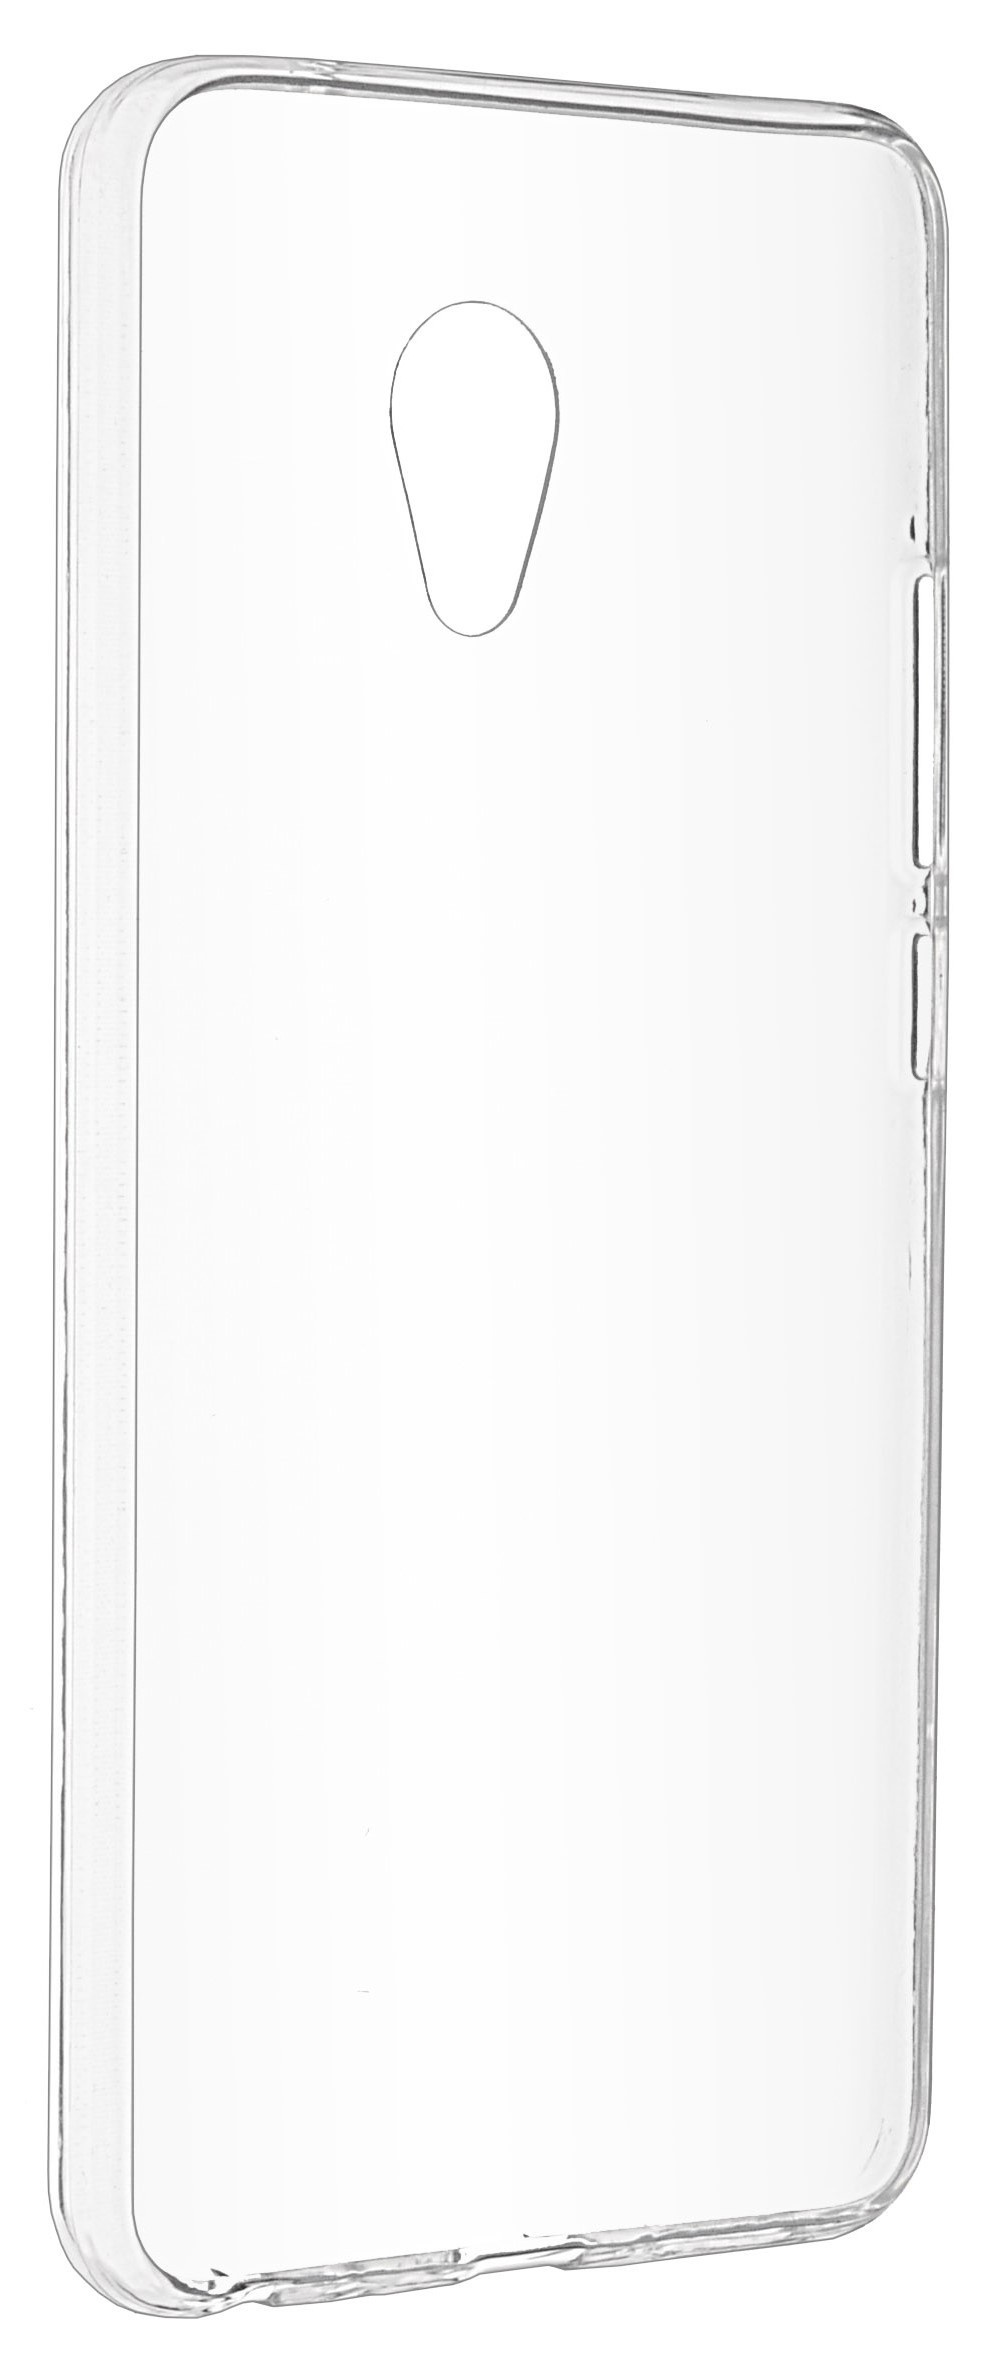 Чехол для сотового телефона skinBOX Slim Silicone, 4660041408157, прозрачный цена и фото